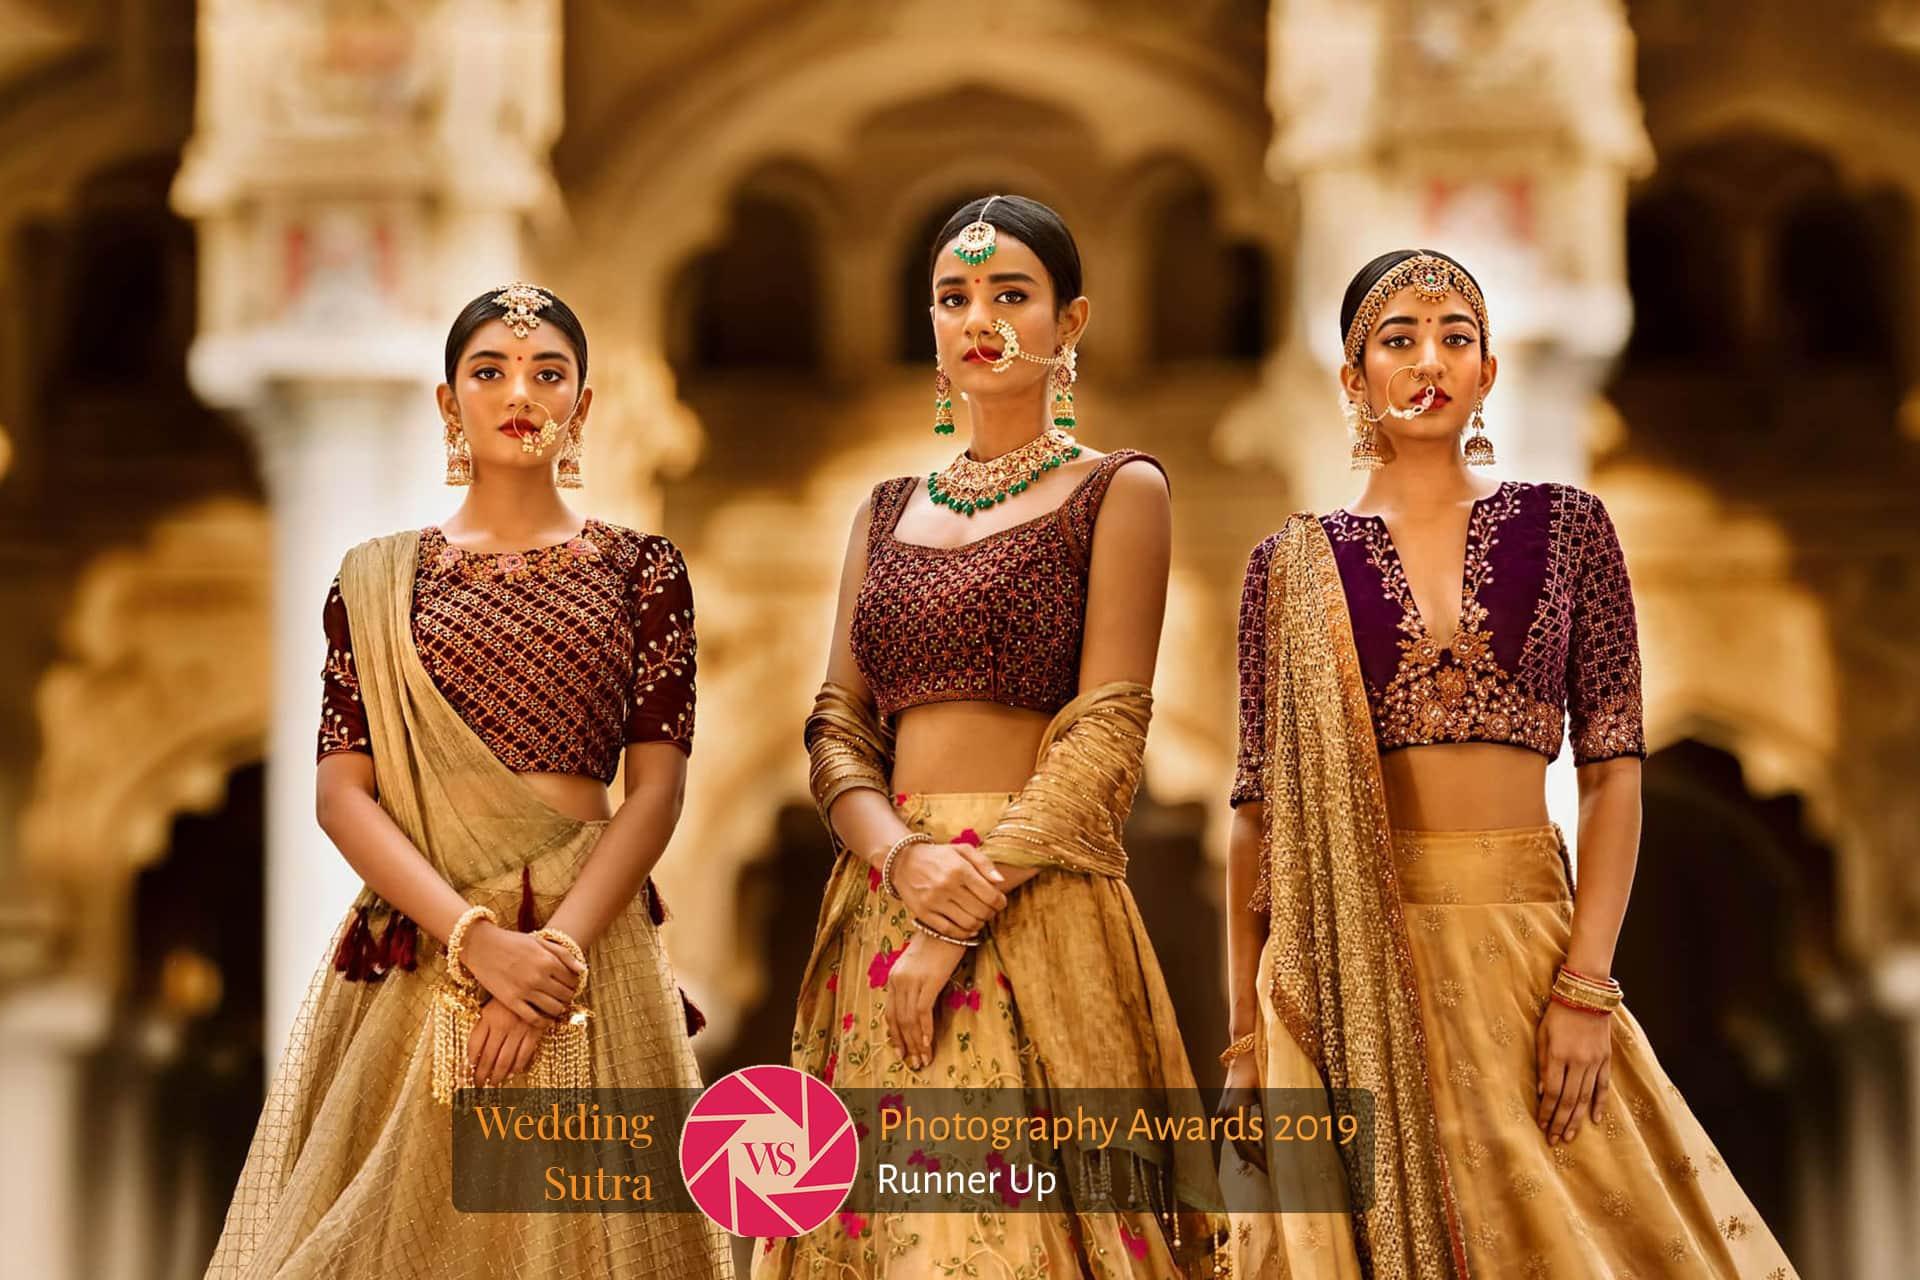 Winner Wedding Sutra Indian Wedding Photography by Arjun Kamath